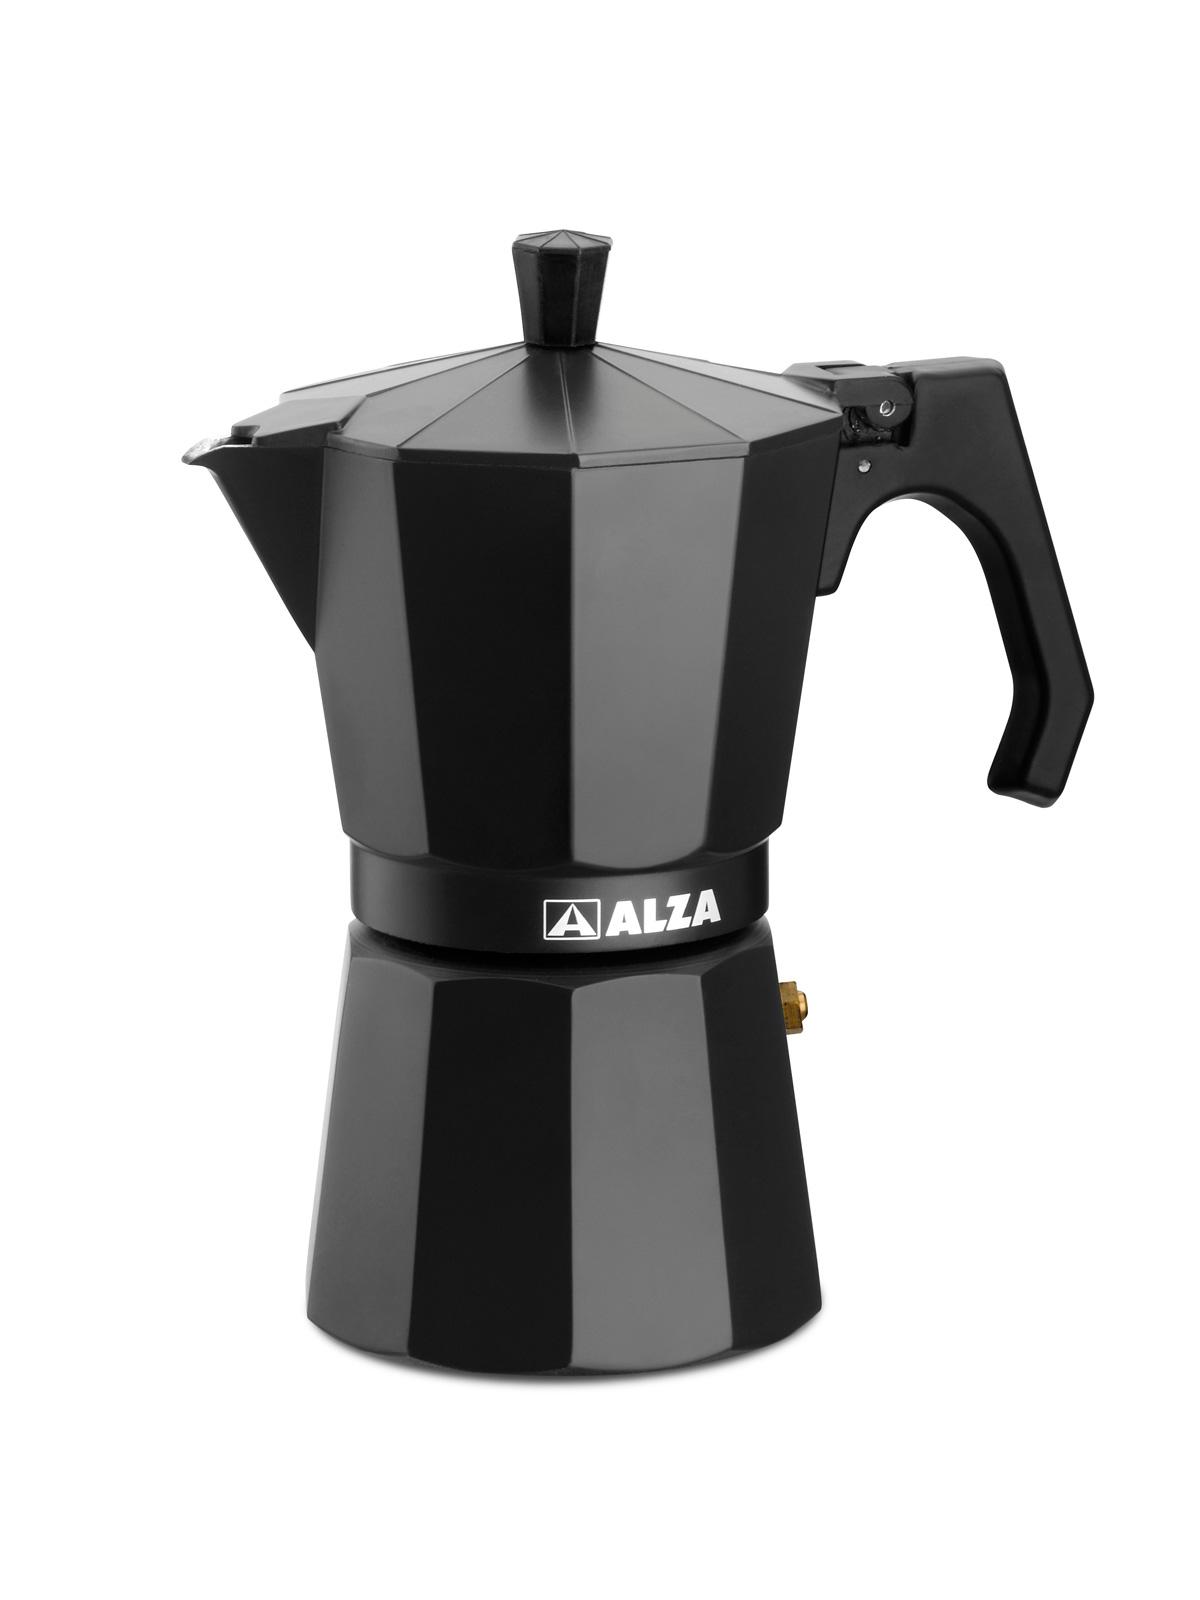 Luxe Red ALZA Cafetera moka o italiana 9 tazas v/álida para Inducci/ón